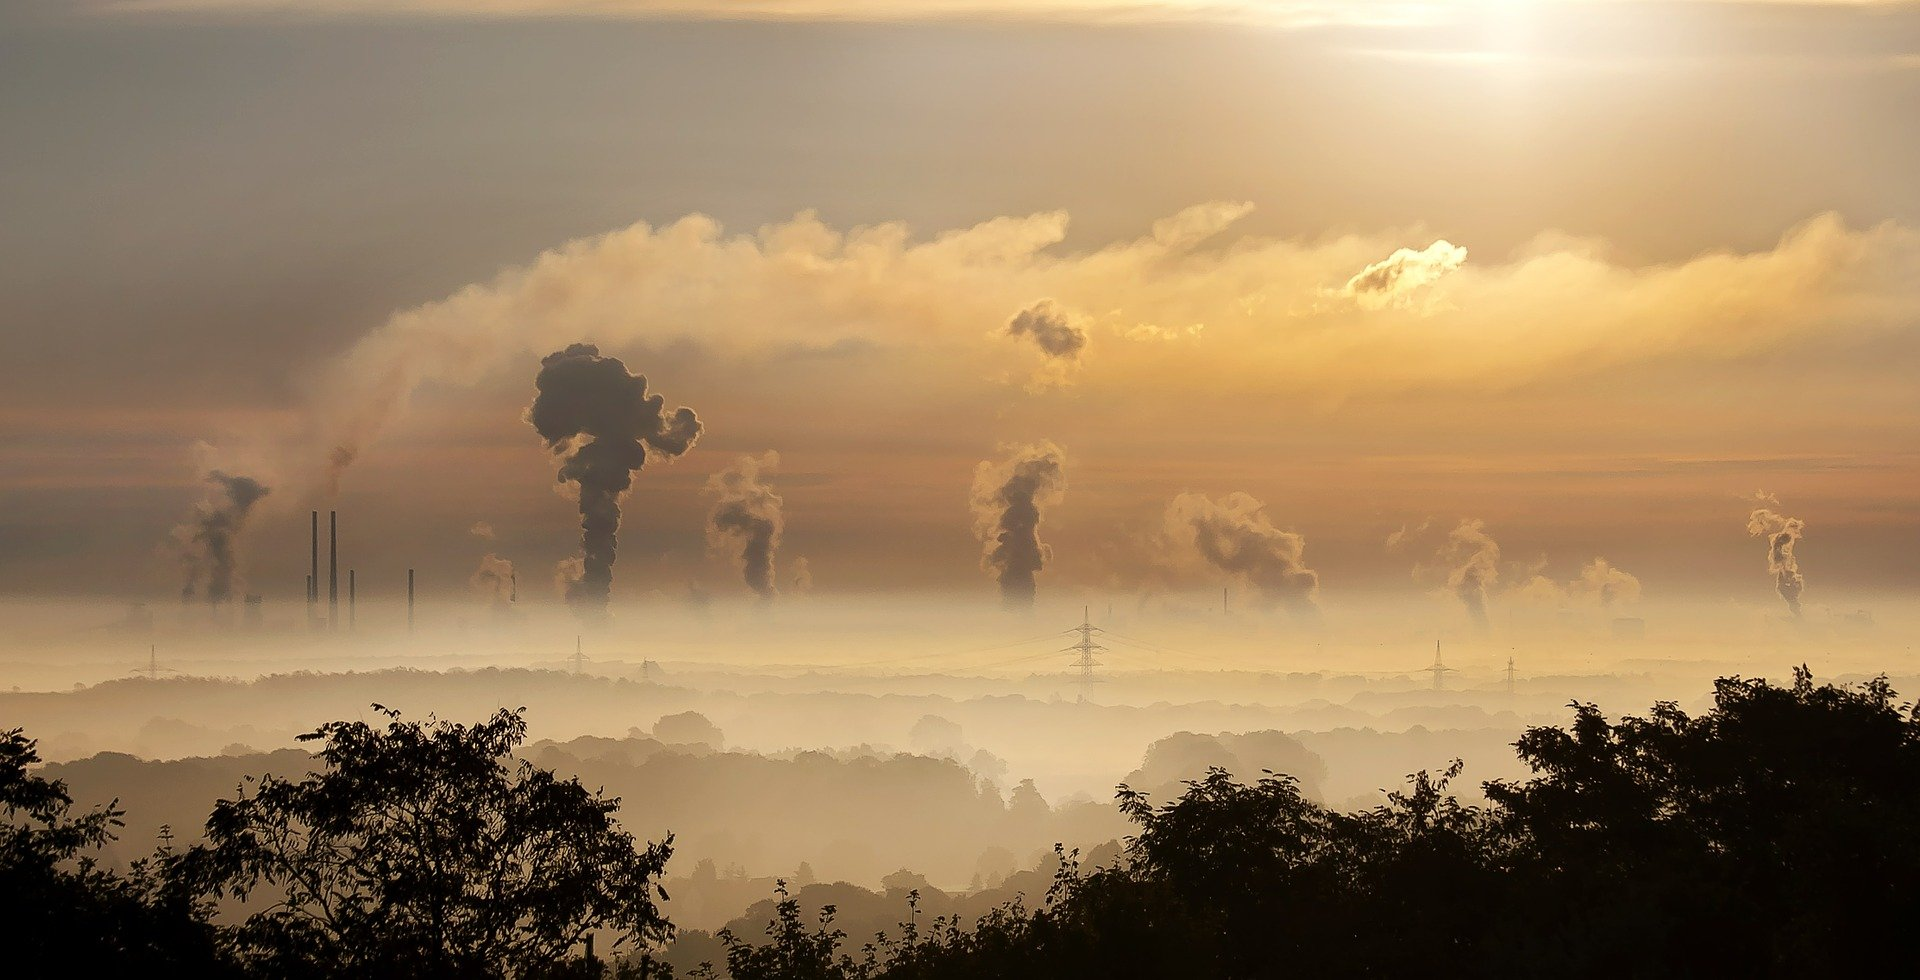 ekologia a pandemia